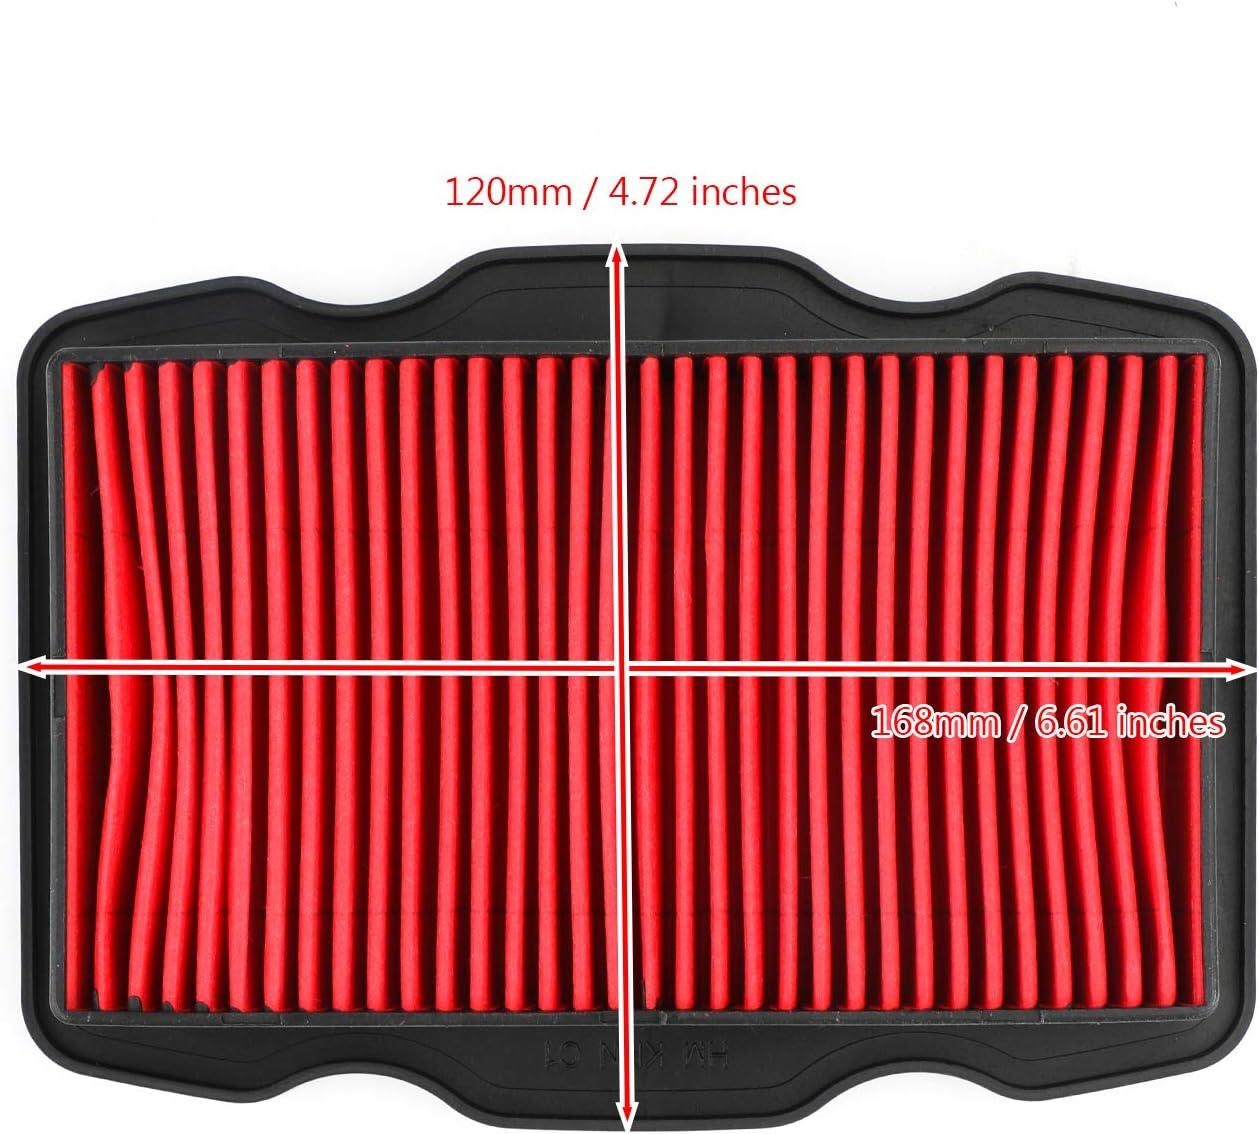 Limpiador de filtro de aire para Hon-da CB125F GLR125 GLR 125 2015 2016 2017 2018 2019